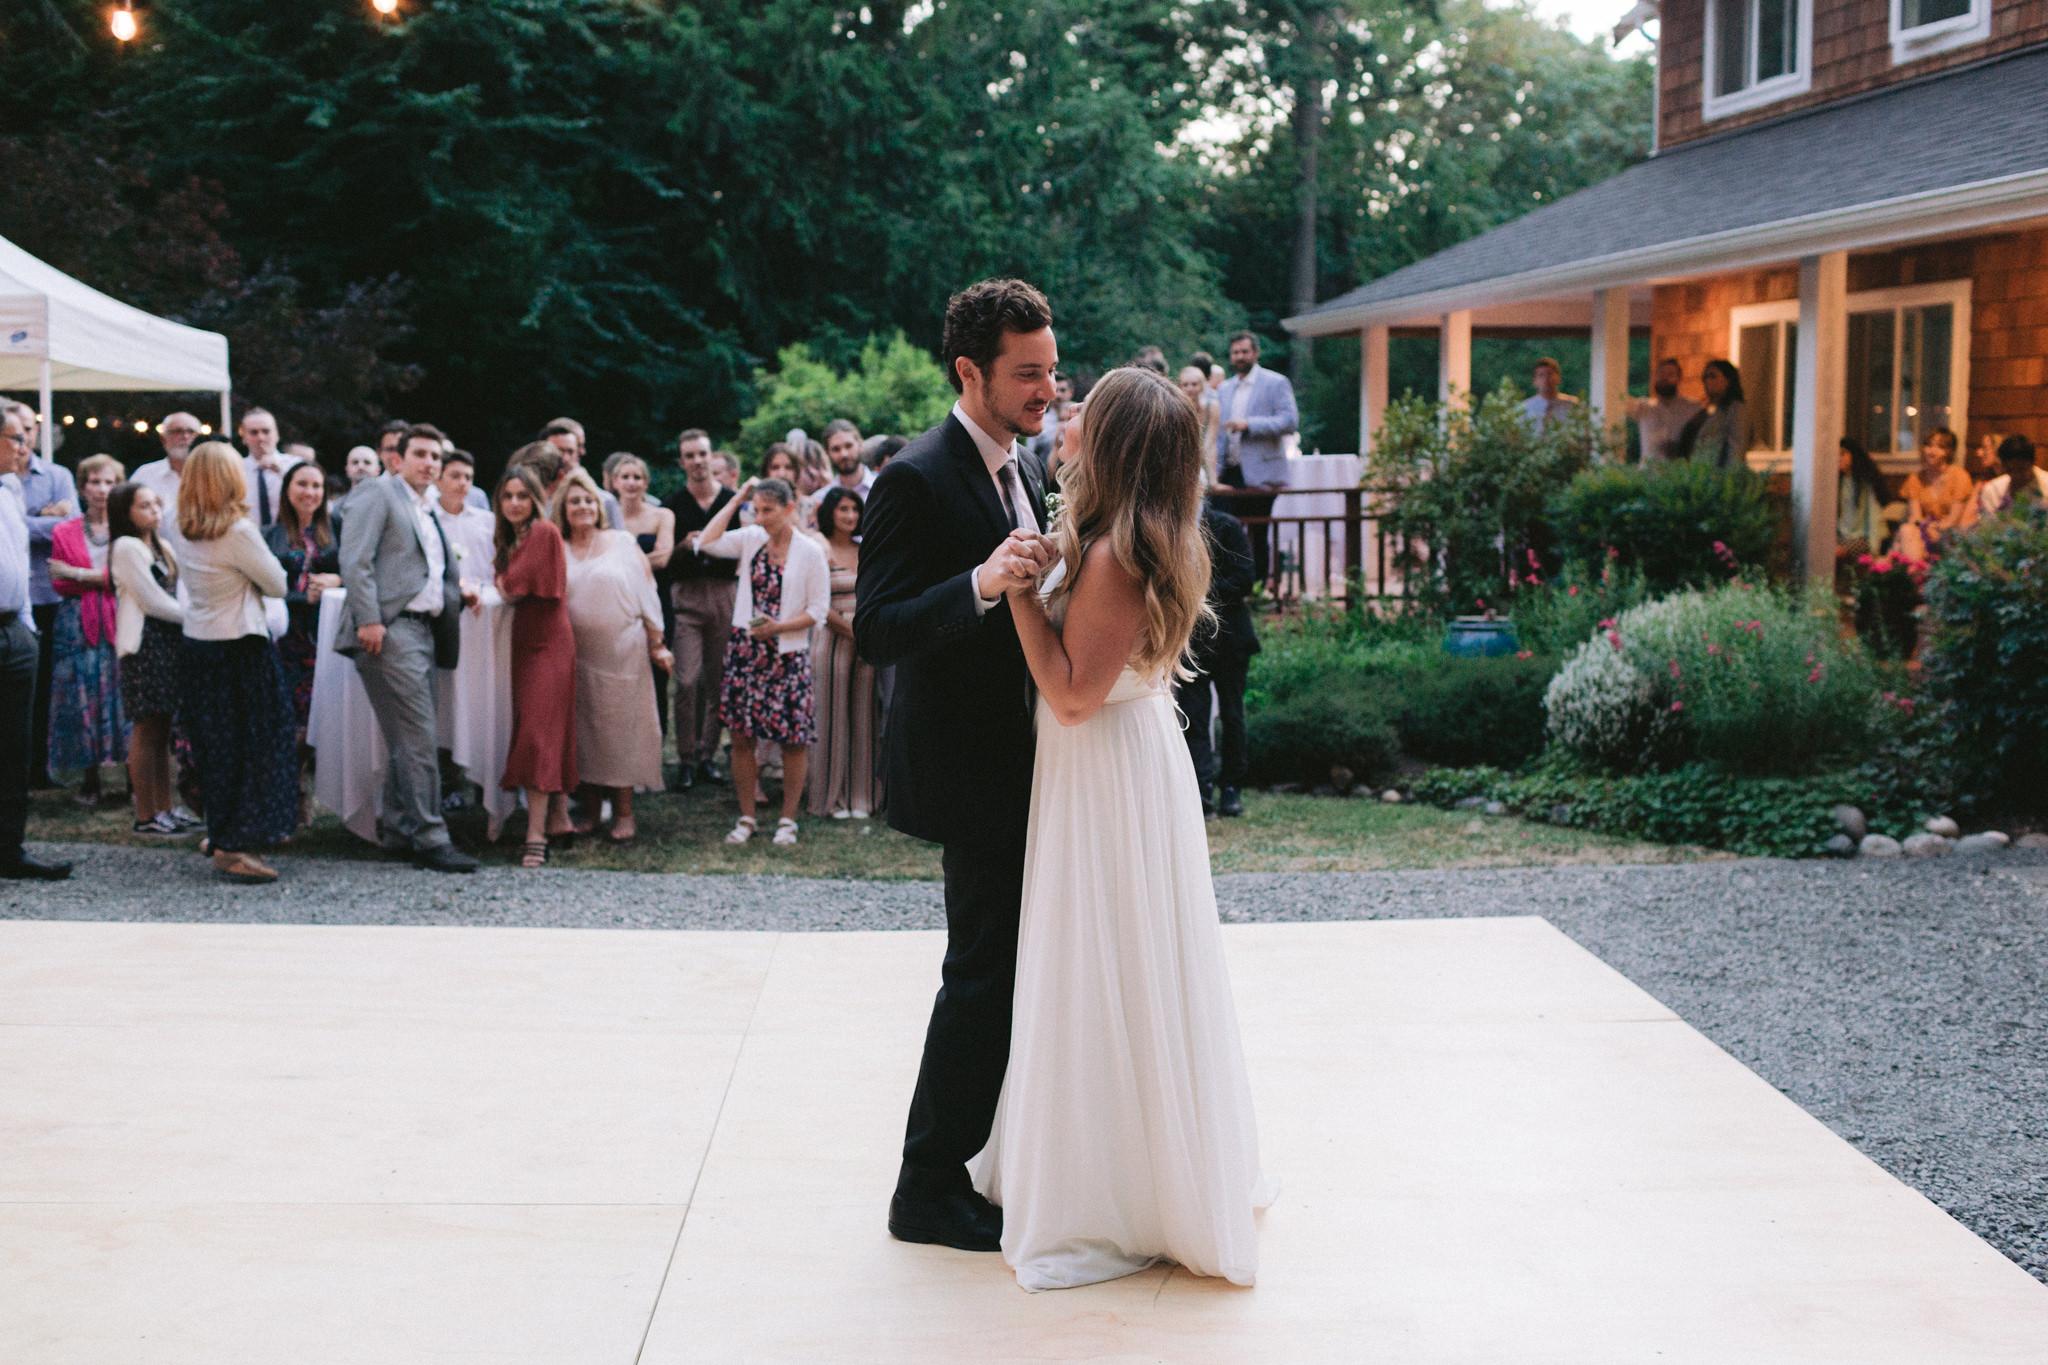 Backyard-Bainbridge-Island-Wedding-Alycia-Lovell-Photography-219.JPG